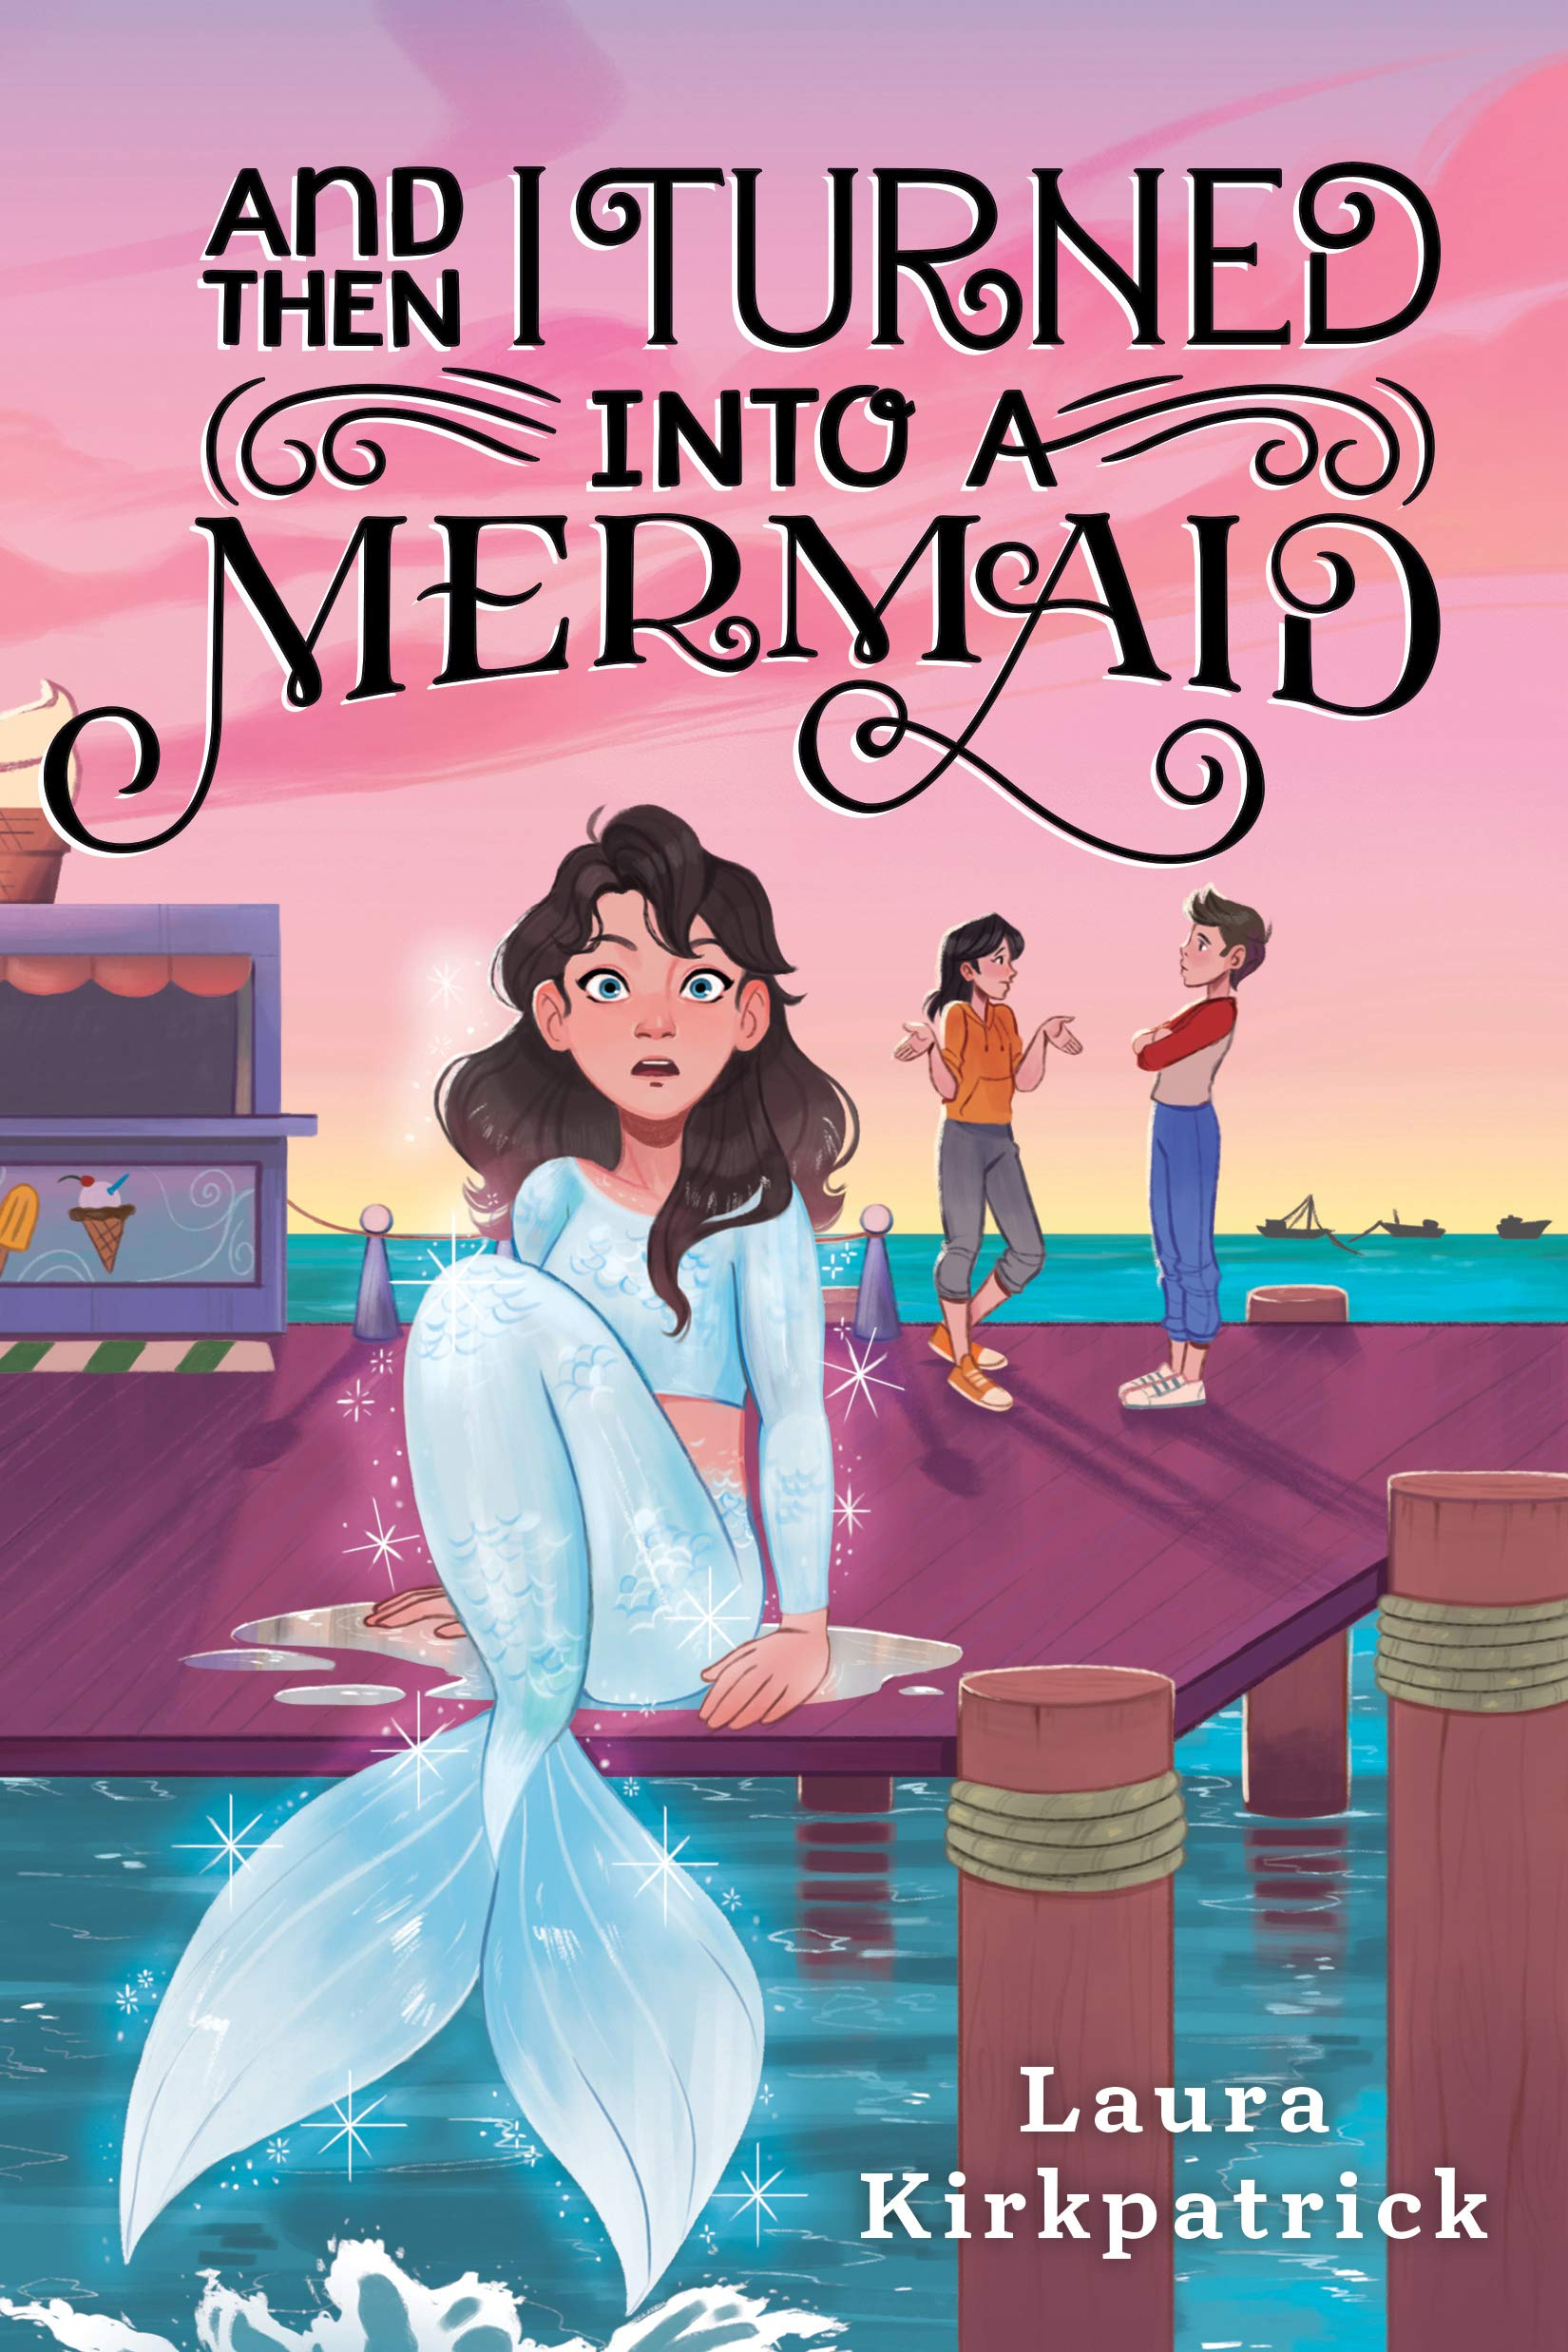 Mermaid transformation fiction